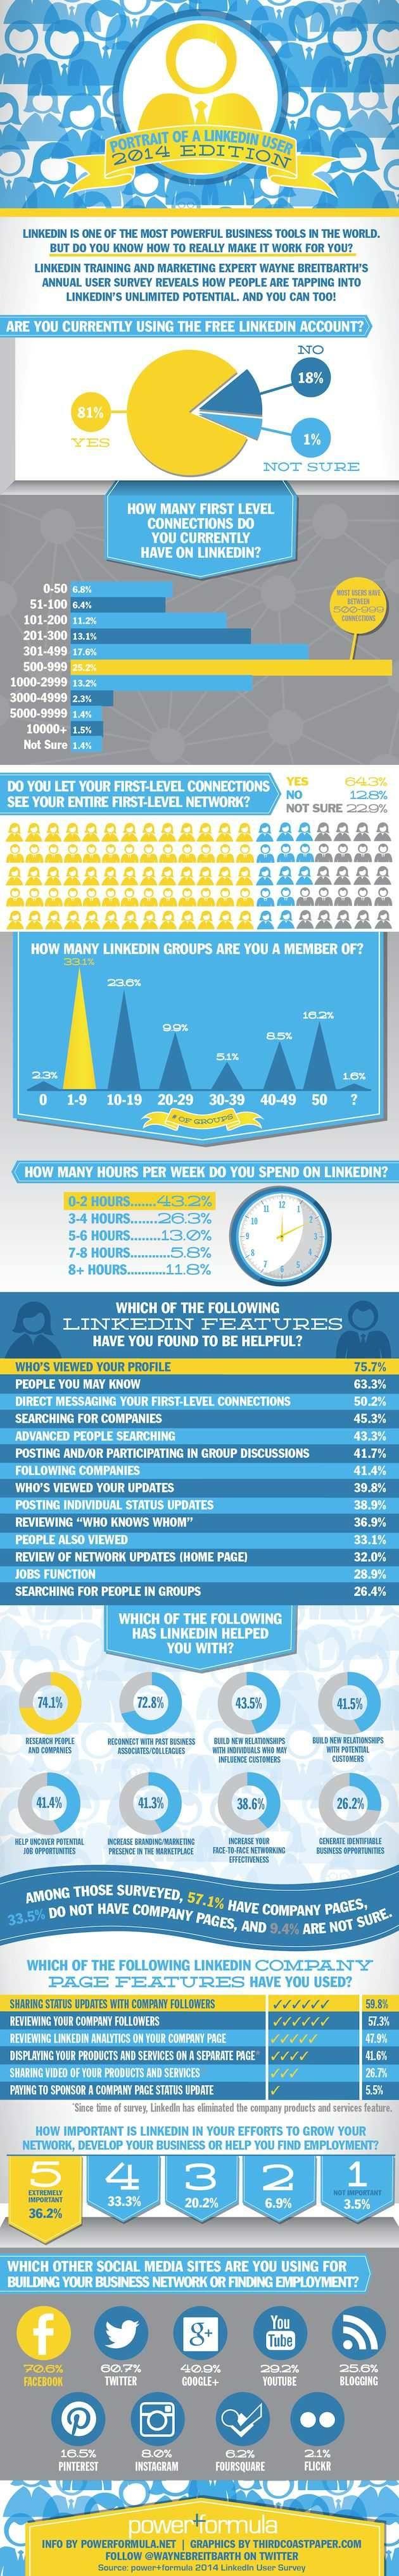 Social Media - How People Use LinkedIn [Infographic] : MarketingProfs Article